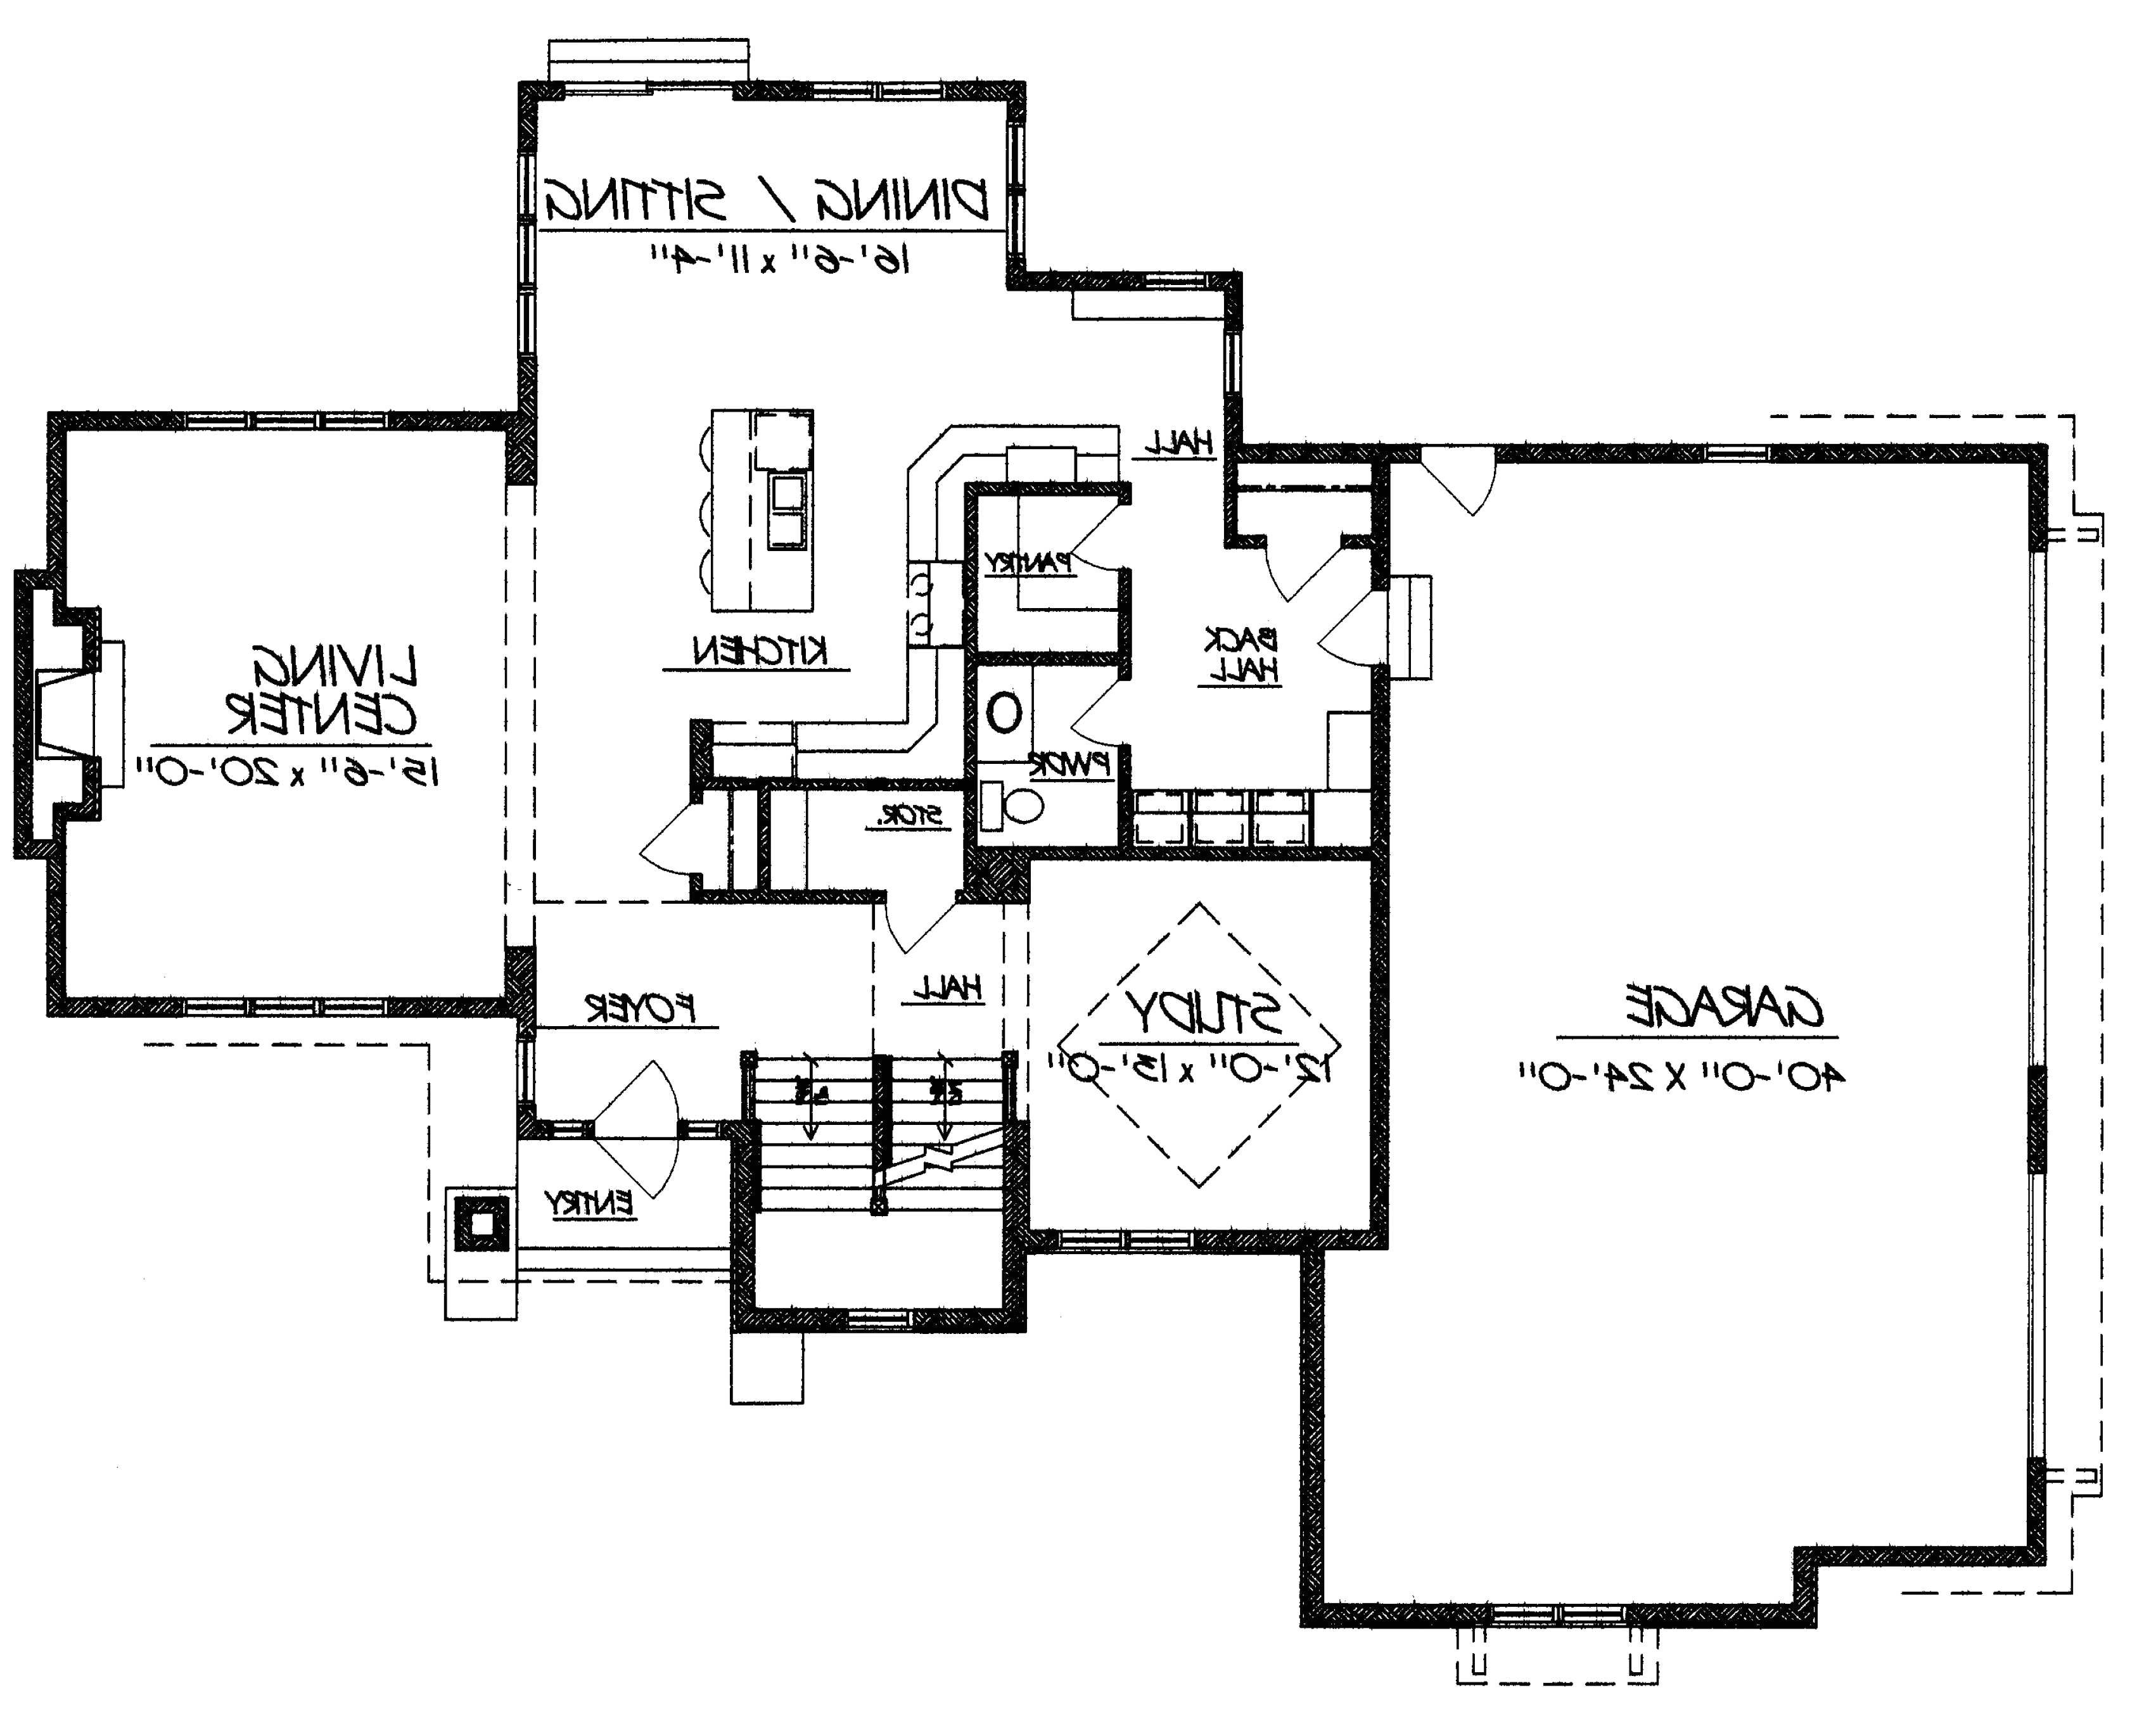 modular home floor plans washington state